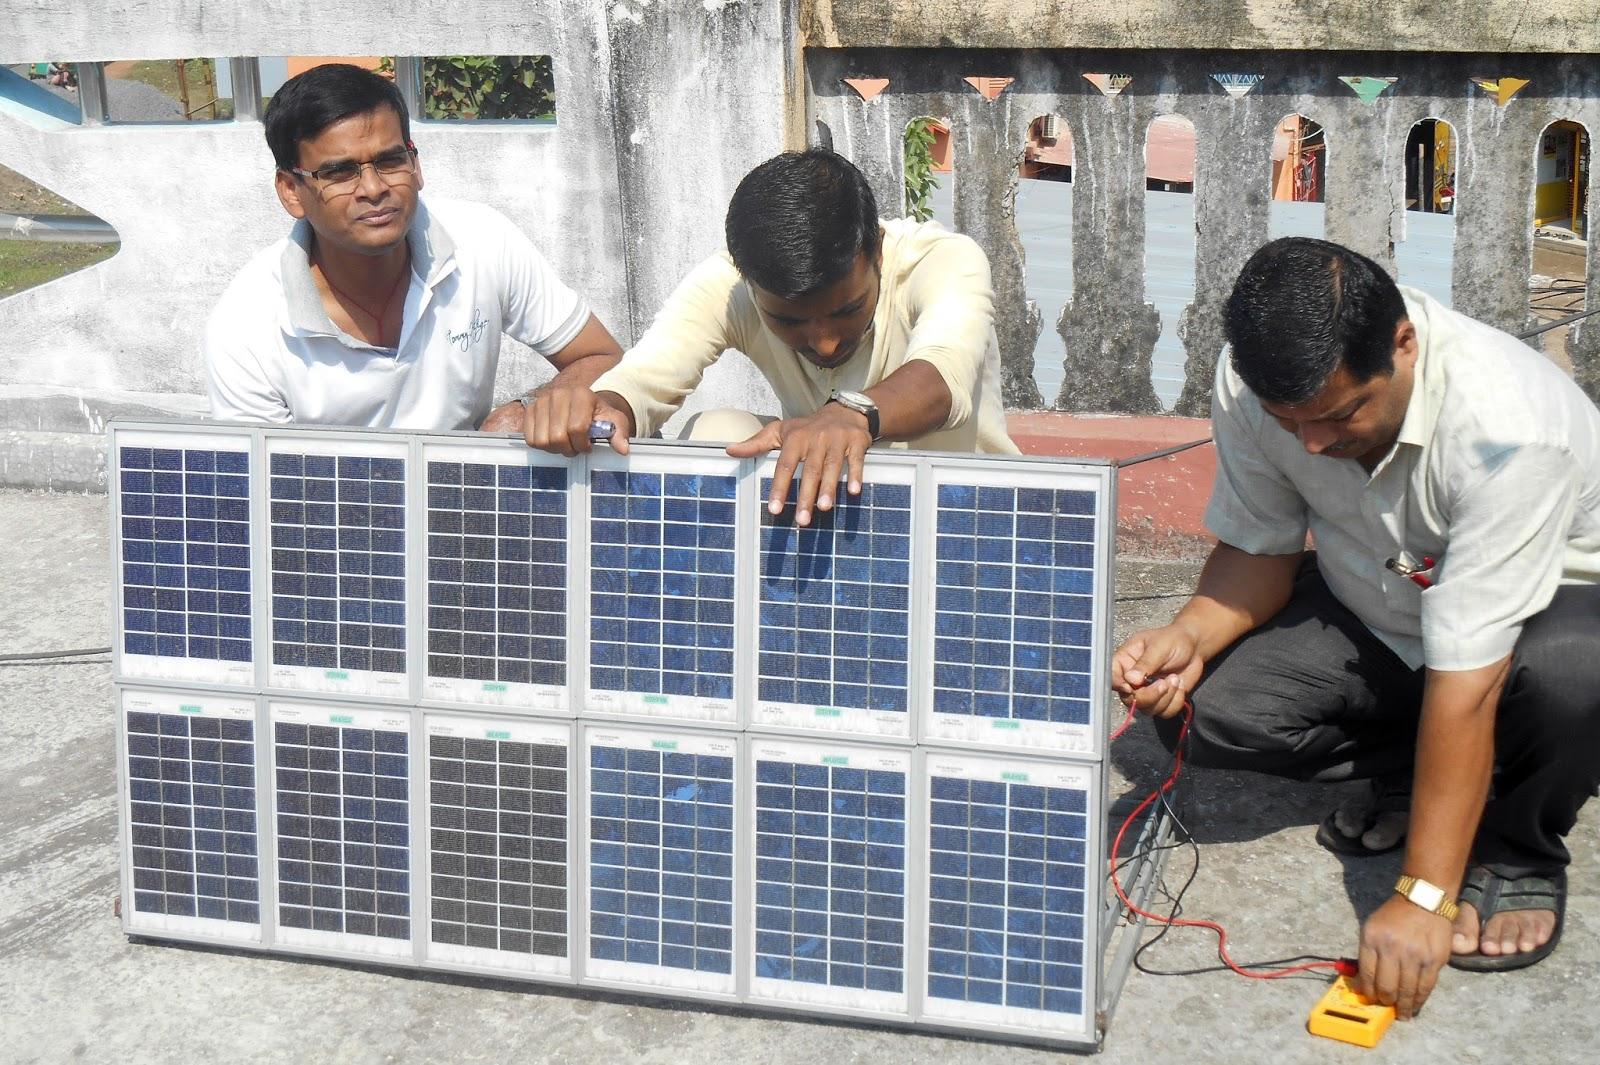 Solar Panel Installation: Solar Panel Installation Engineer Jobs